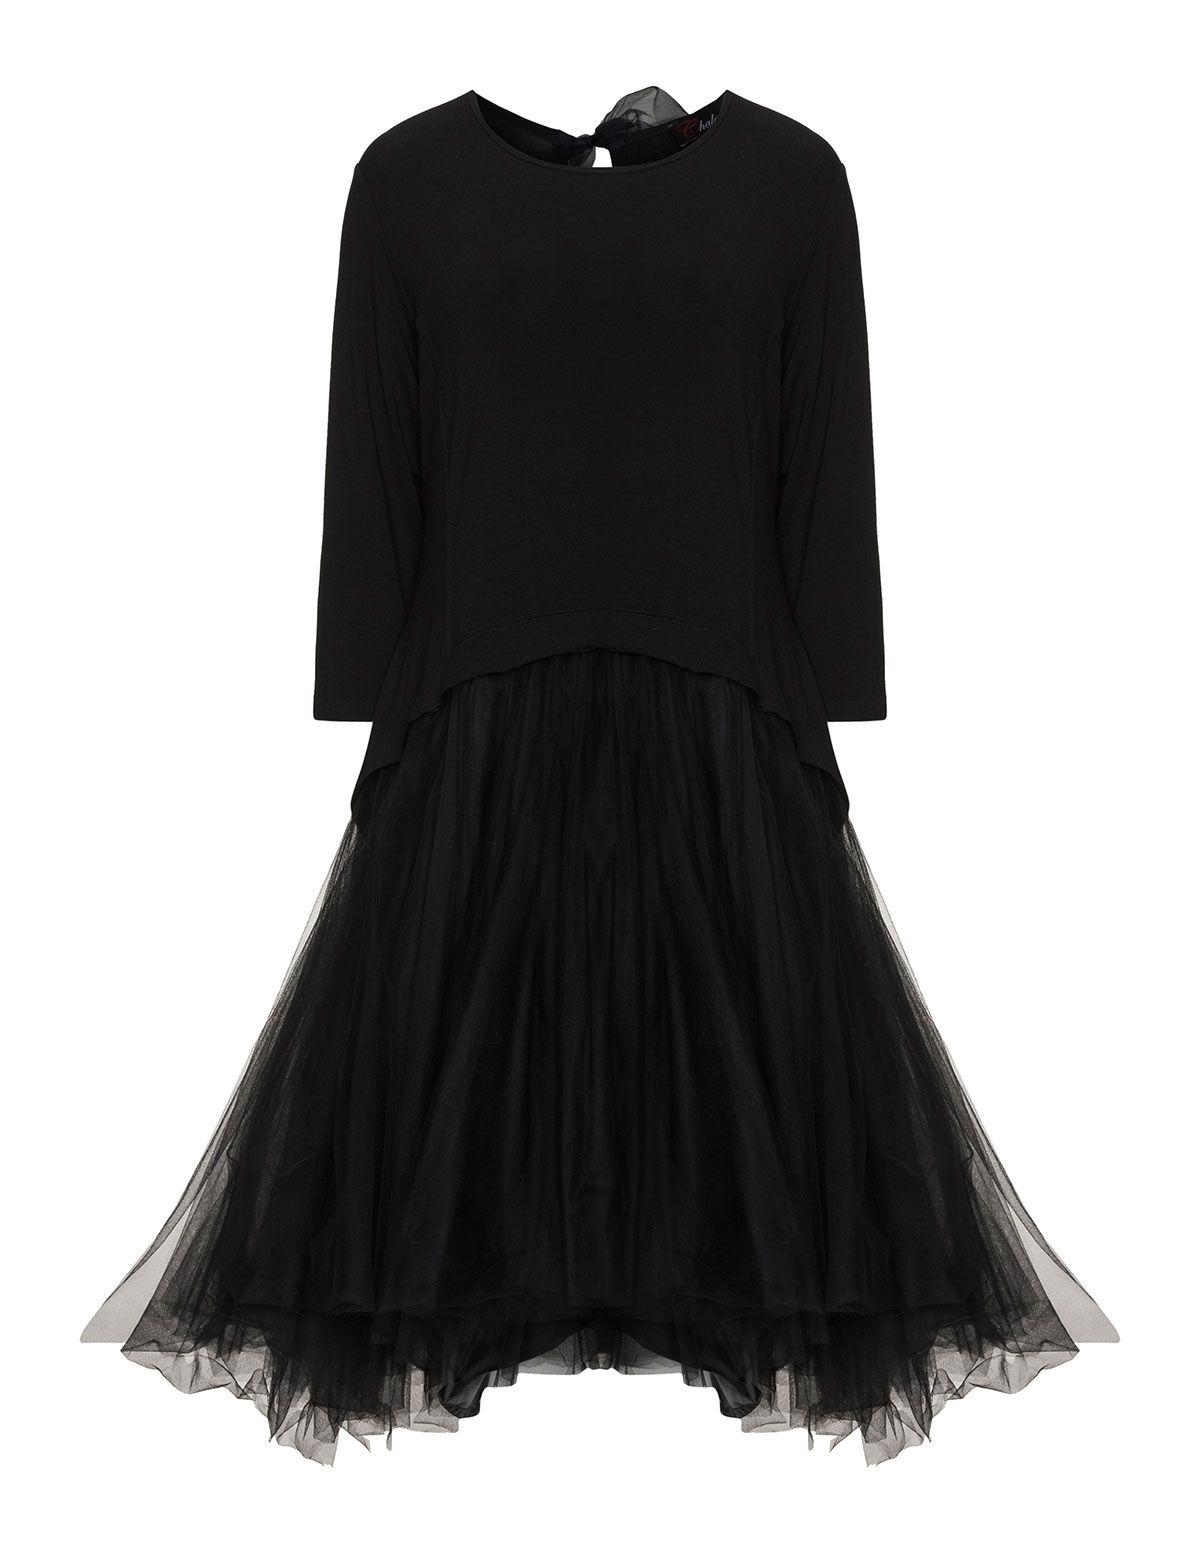 Chalona A-Linien Tüllkleid in Schwarz | Plus Size Outfit | Pinterest ...